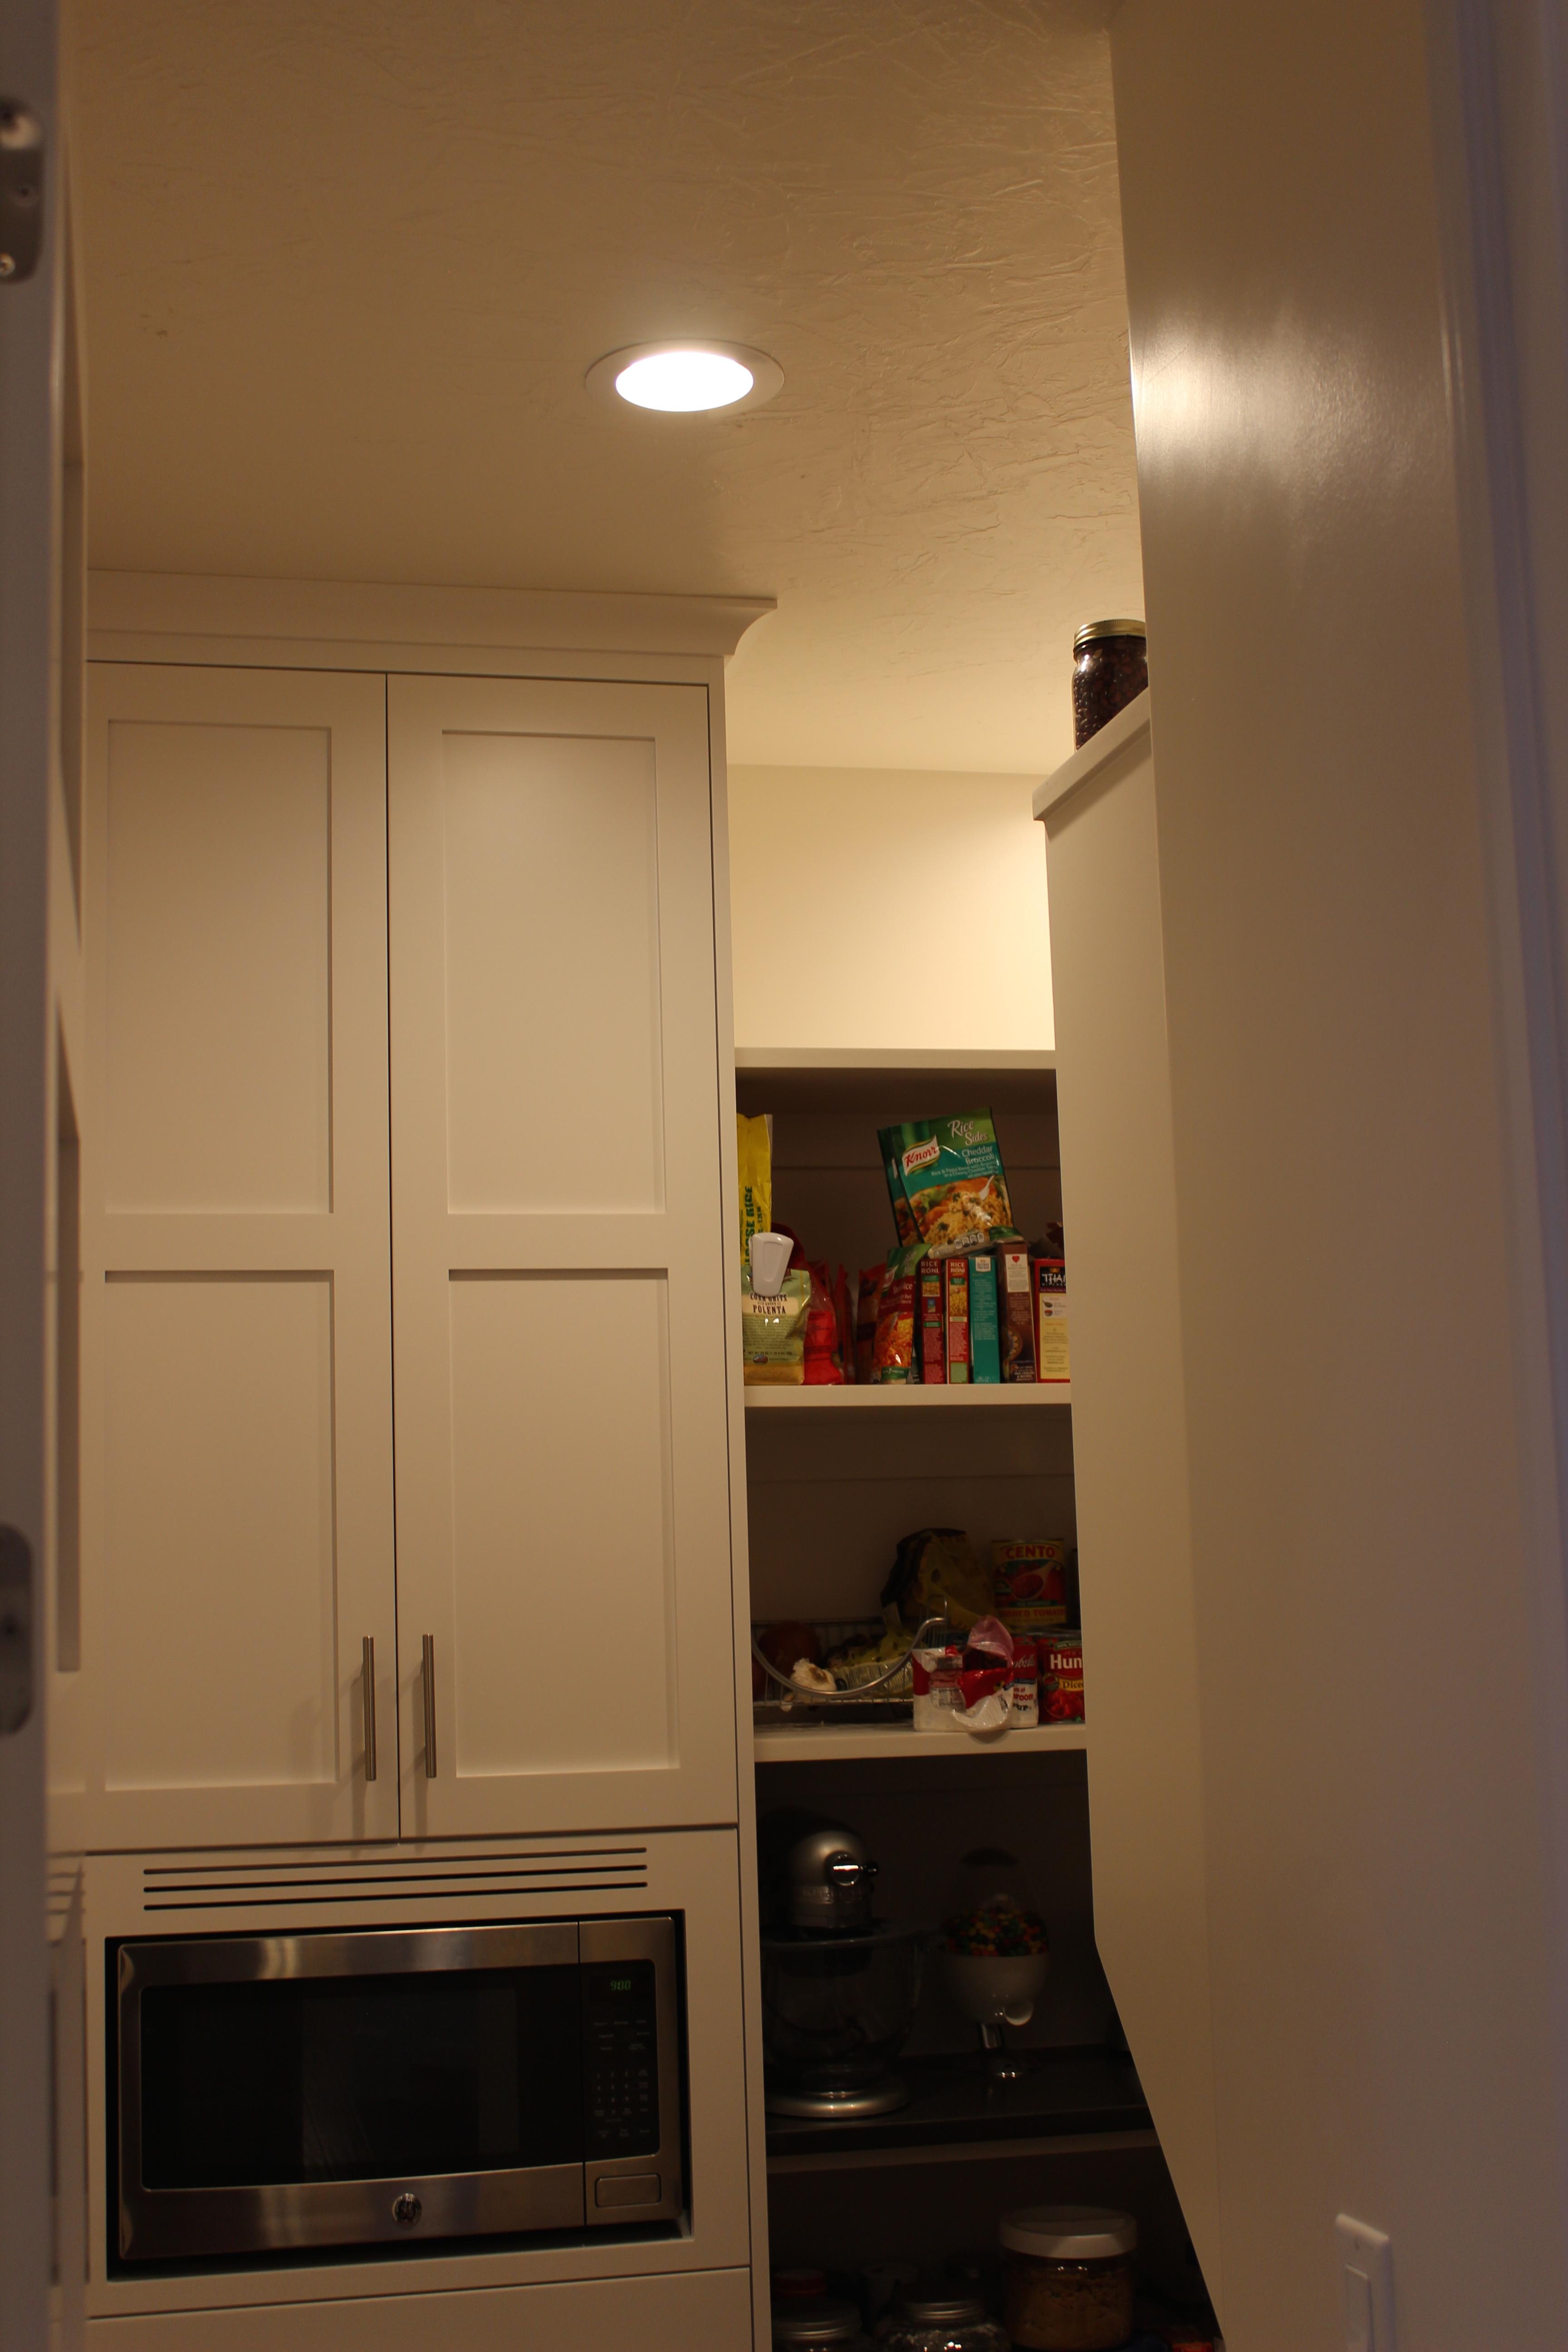 Innovative Lighting & Electrical image 9